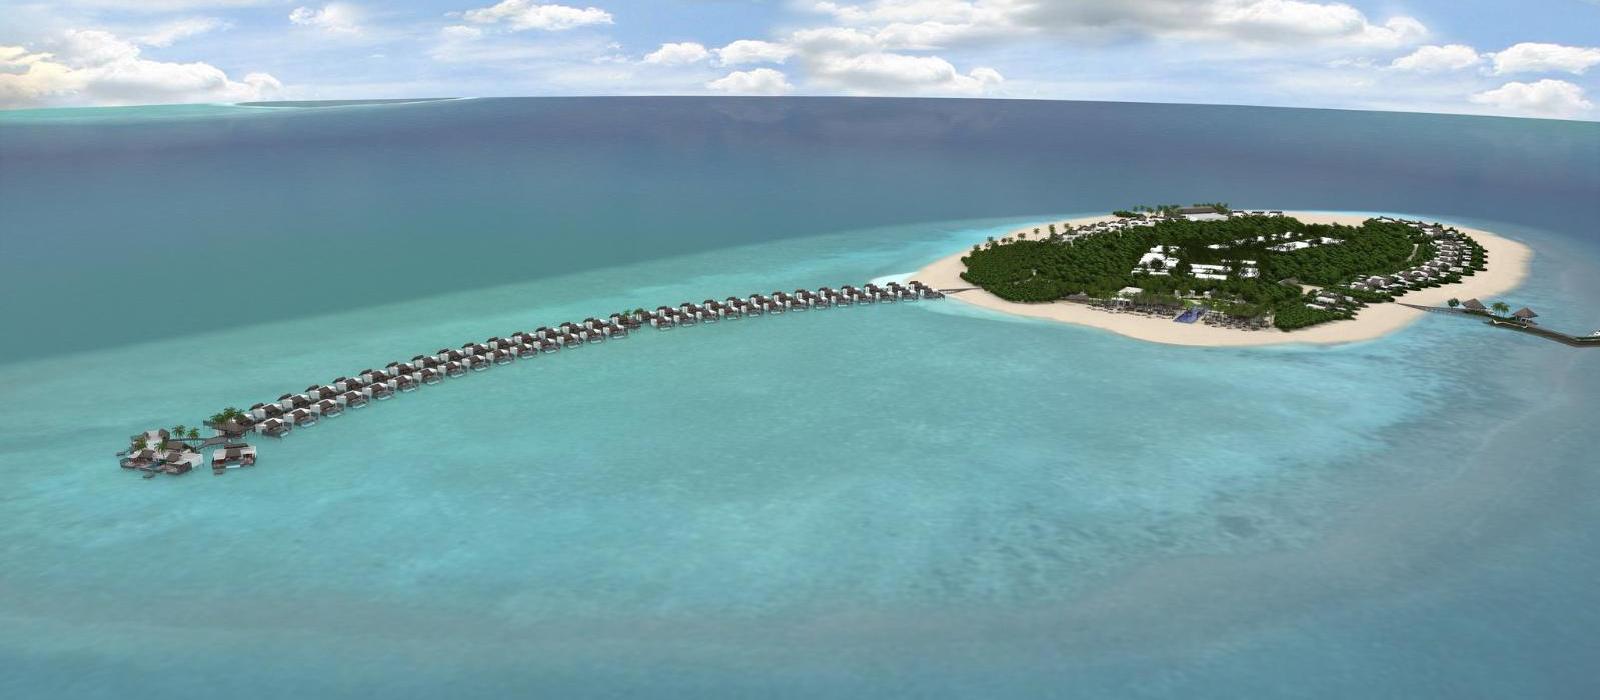 马尔代夫爱慕瑞德度假村(Emerald Maldives Resort & Spa) 图片  www.lhw.cn